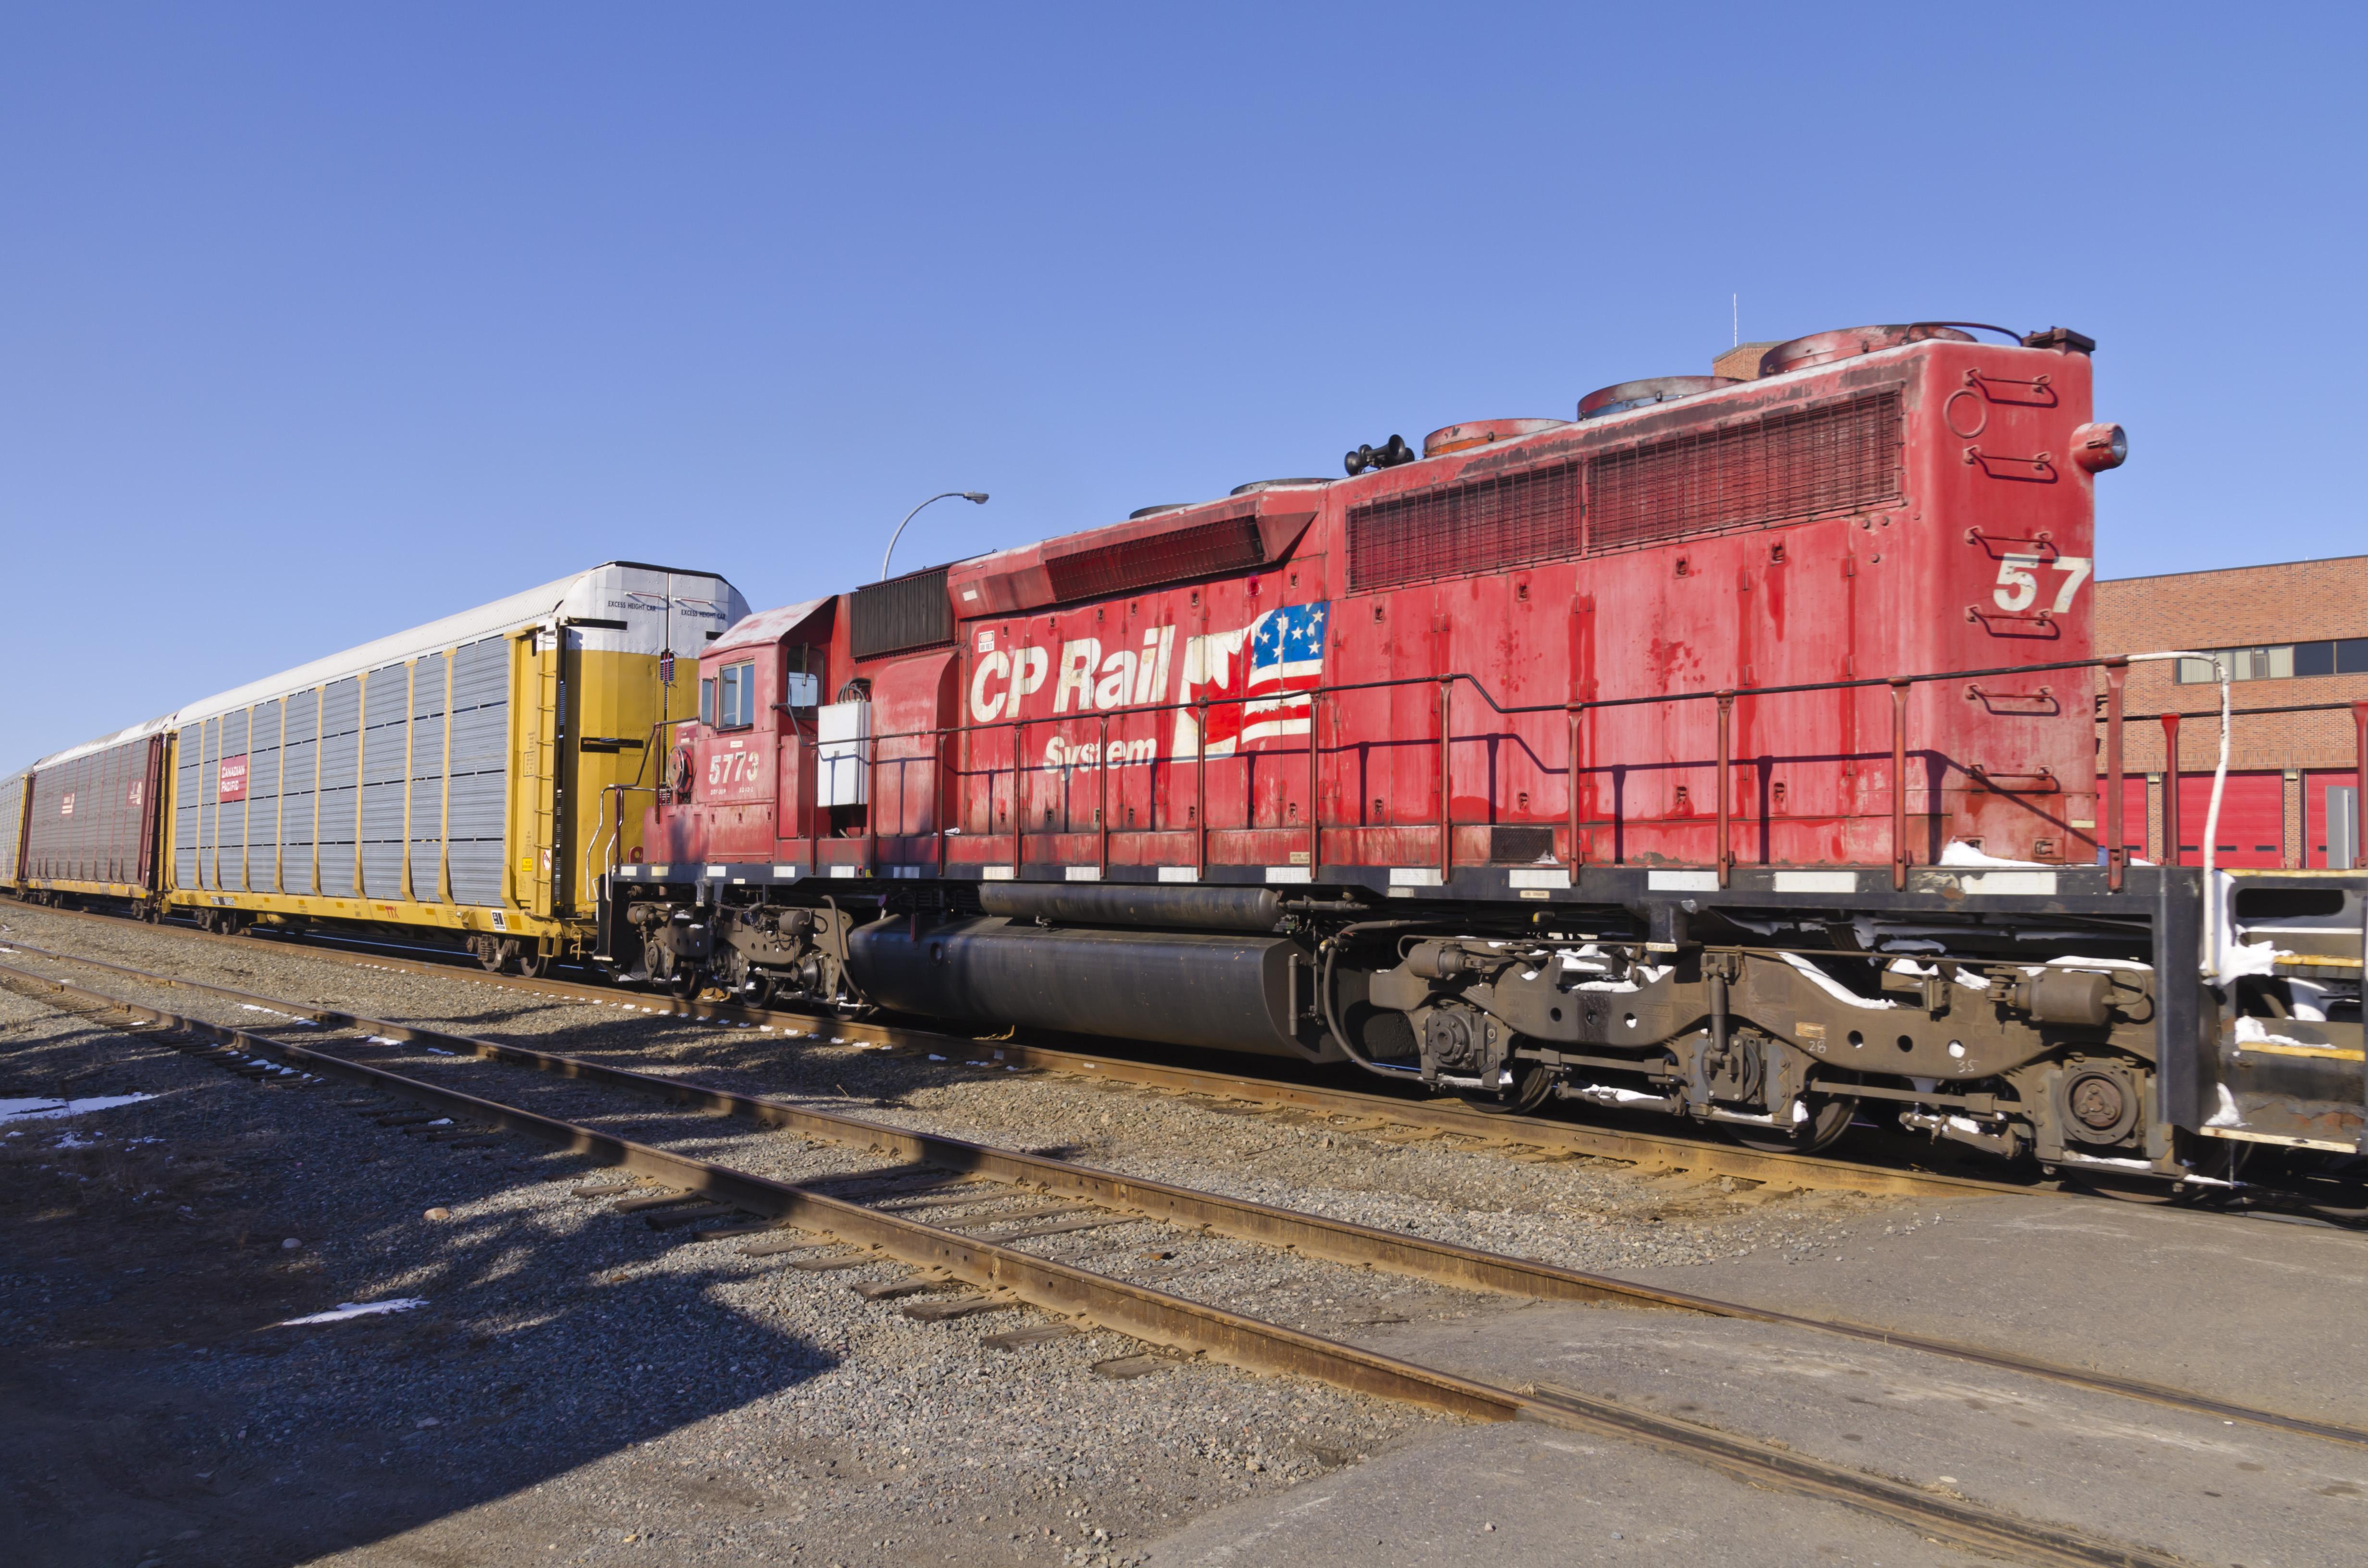 Canadian Pacific Railway (CP) #5773. Diesel Locomotive EMD SD40-2, 2 Apr  2013